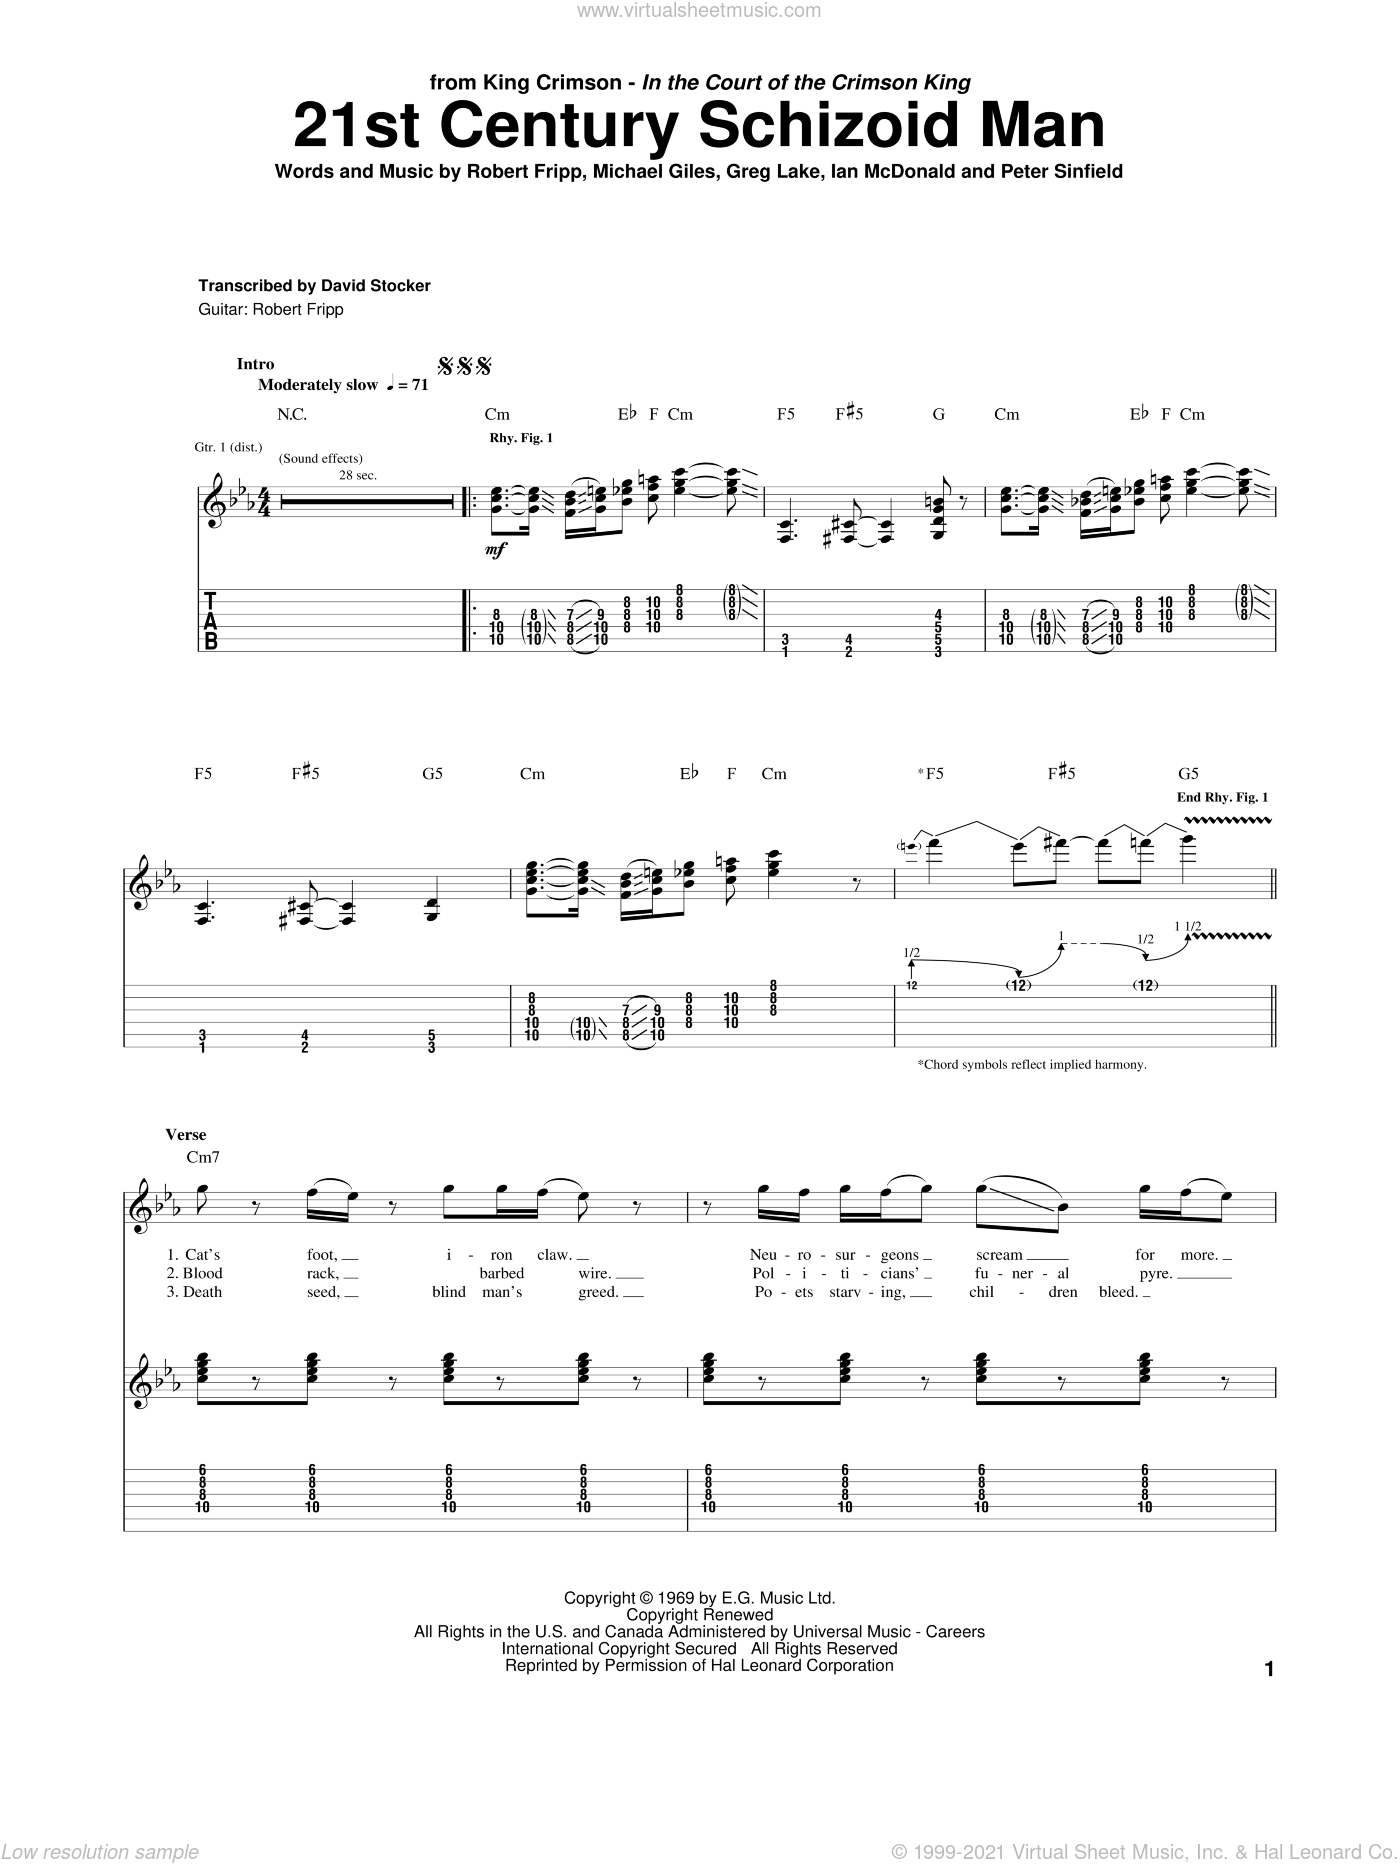 21st Century Schizoid Man sheet music for guitar (tablature) by King Crimson, Greg Lake, Ian McDonald, Michael Giles, Peter Sinfield and Robert Fripp, intermediate skill level